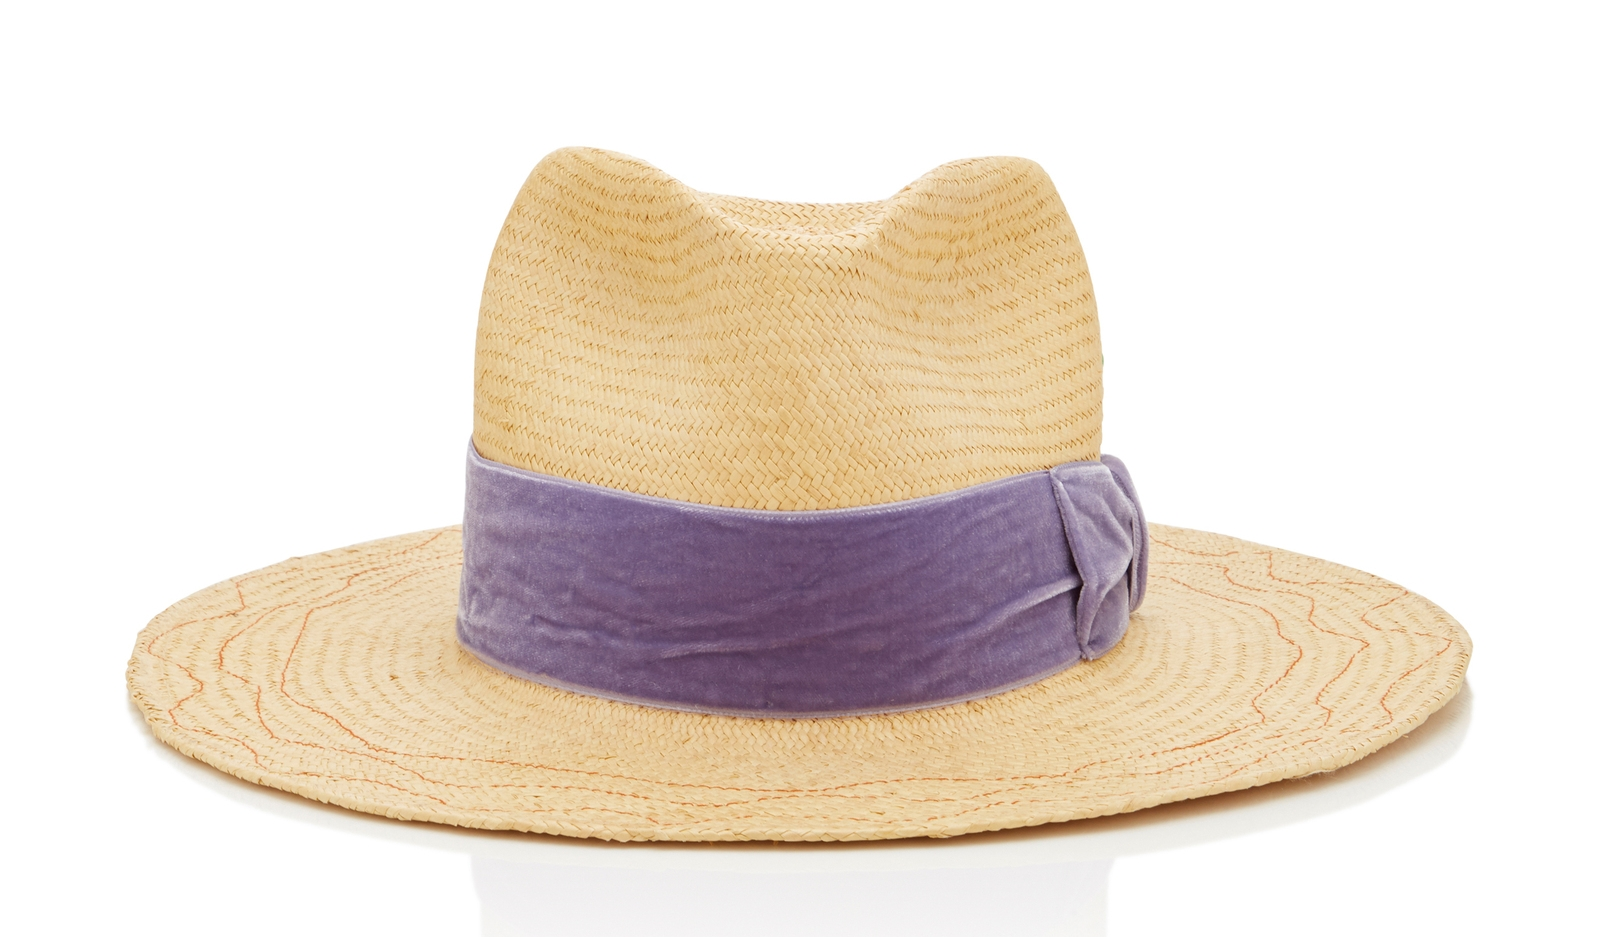 large_nick-fouquet-neutral-arizona-bahia-straw-hat.jpg